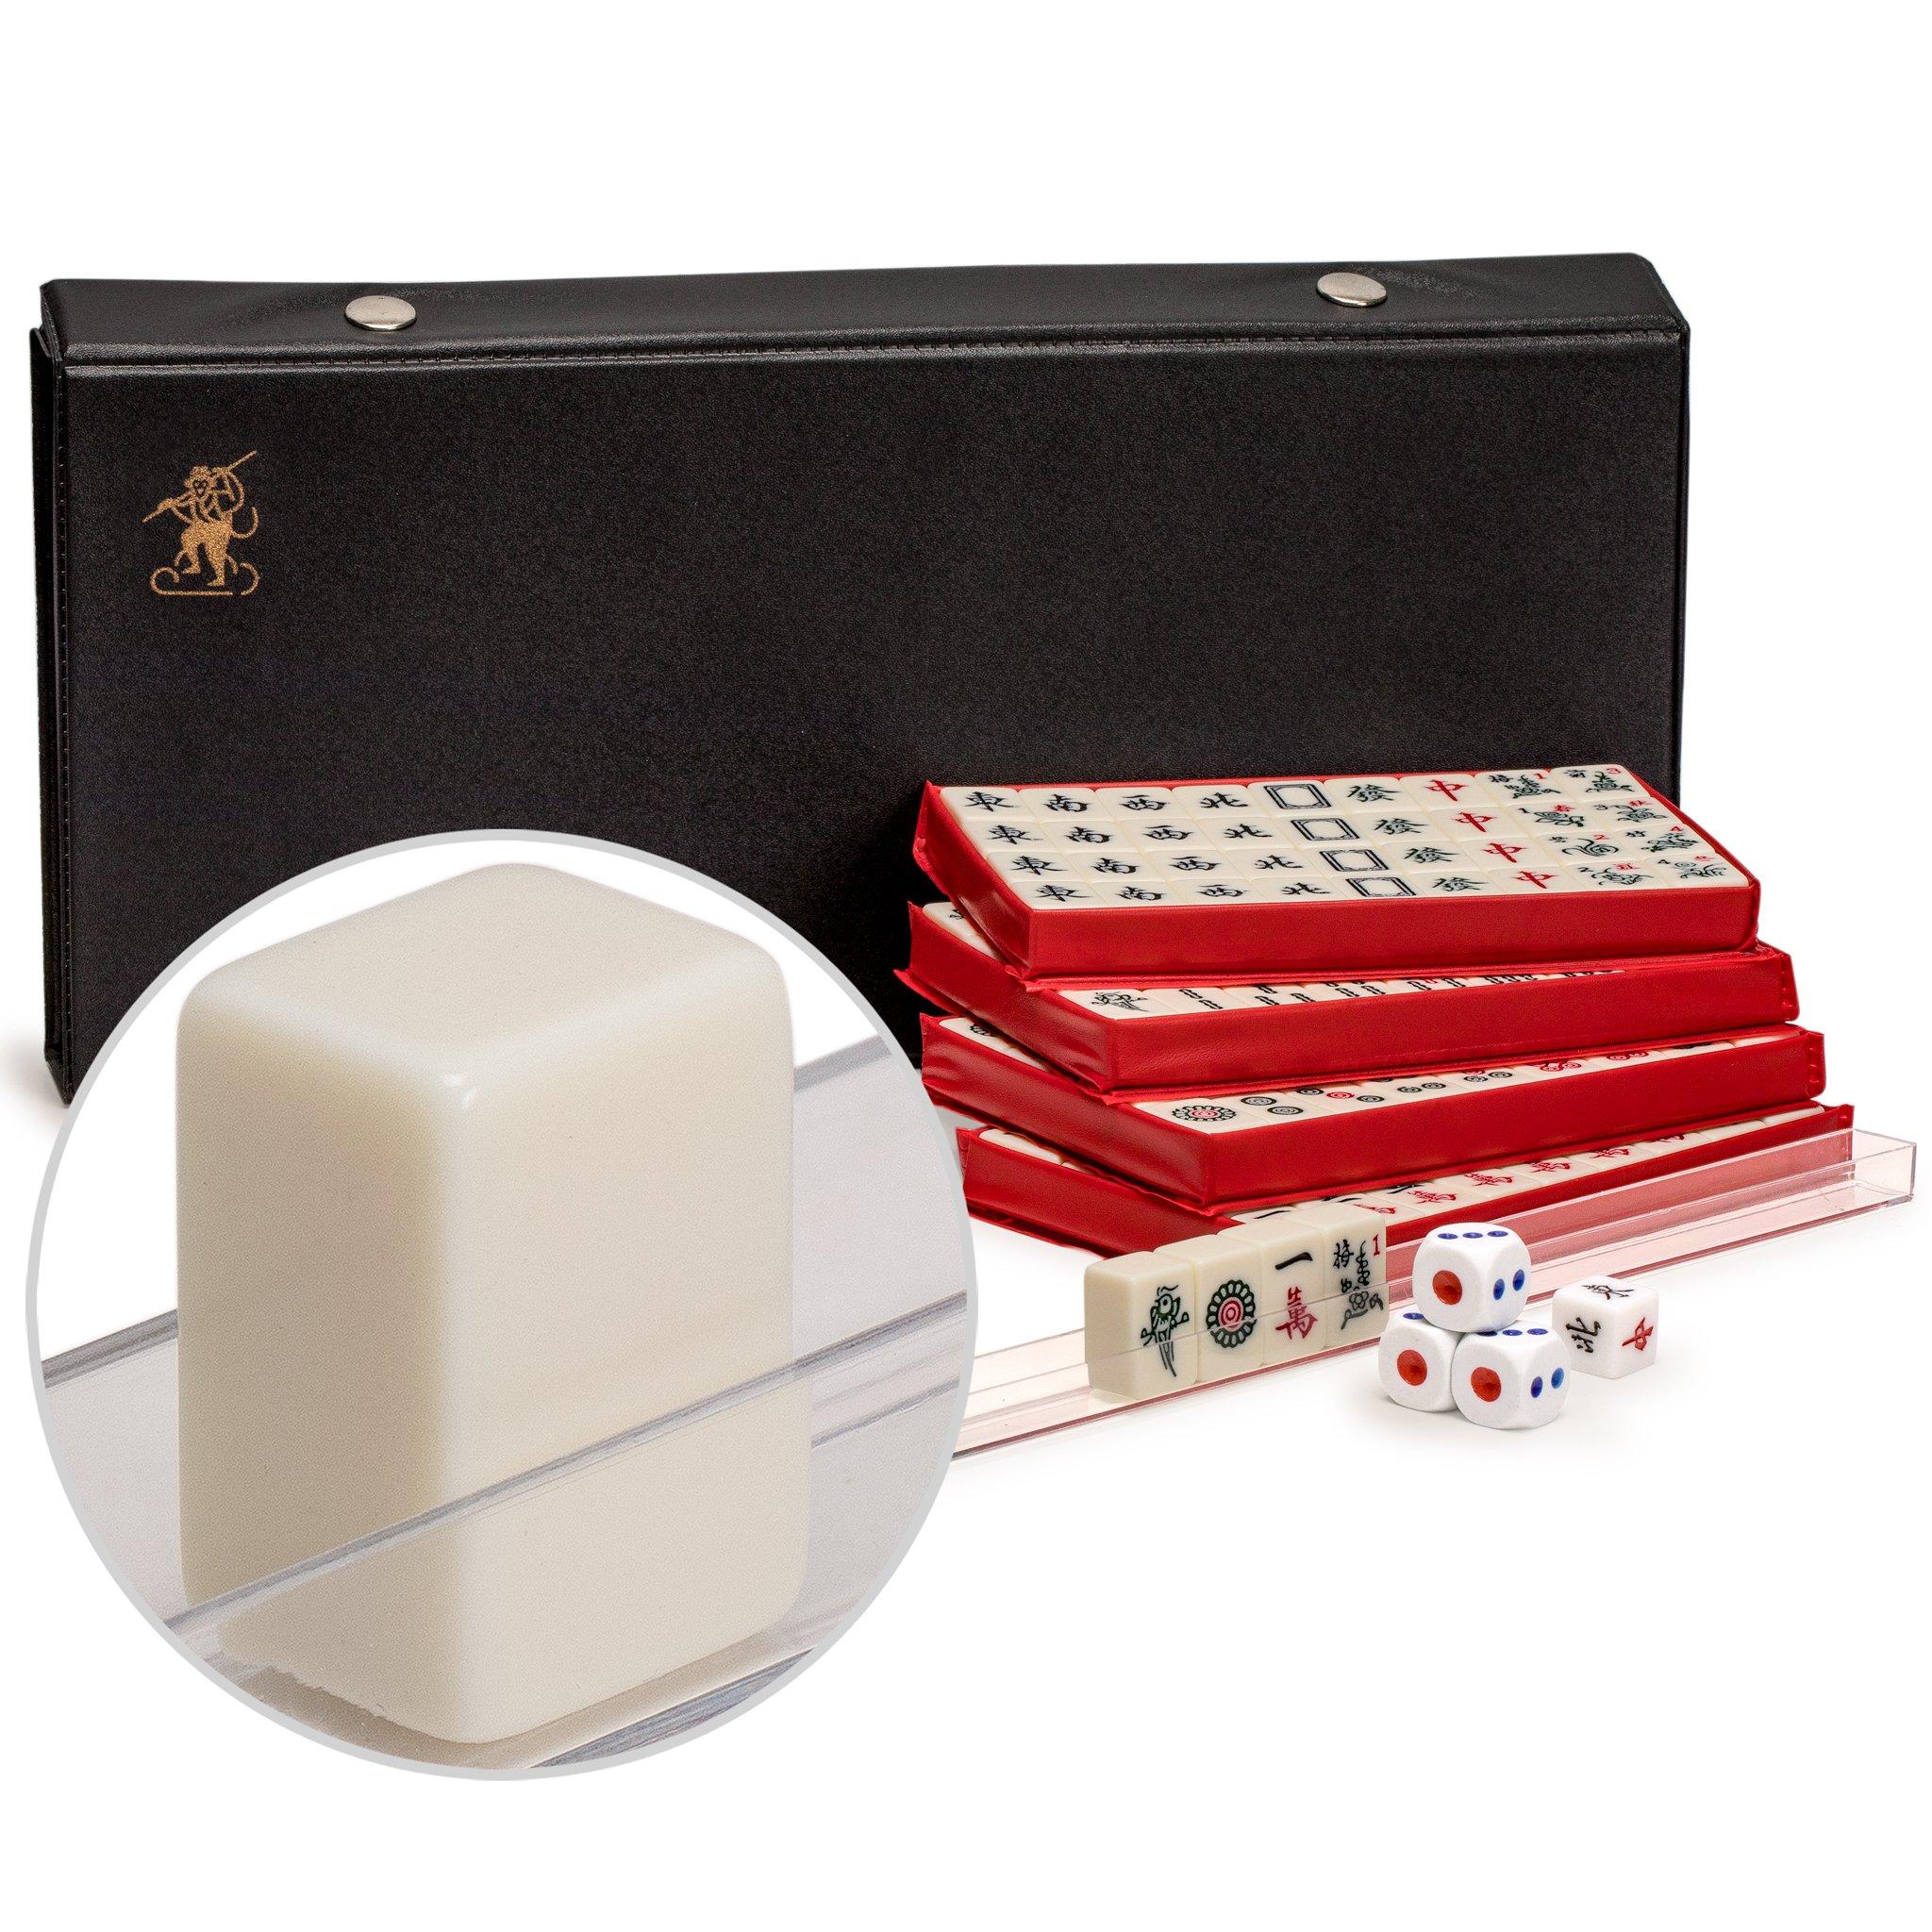 Yellow Mountain Imports Chinese Mahjong (Mahjongg, Mah Jongg, Mah-Jongg, Majiang) Travel Game Set with Extra Small White Tiles, Mini